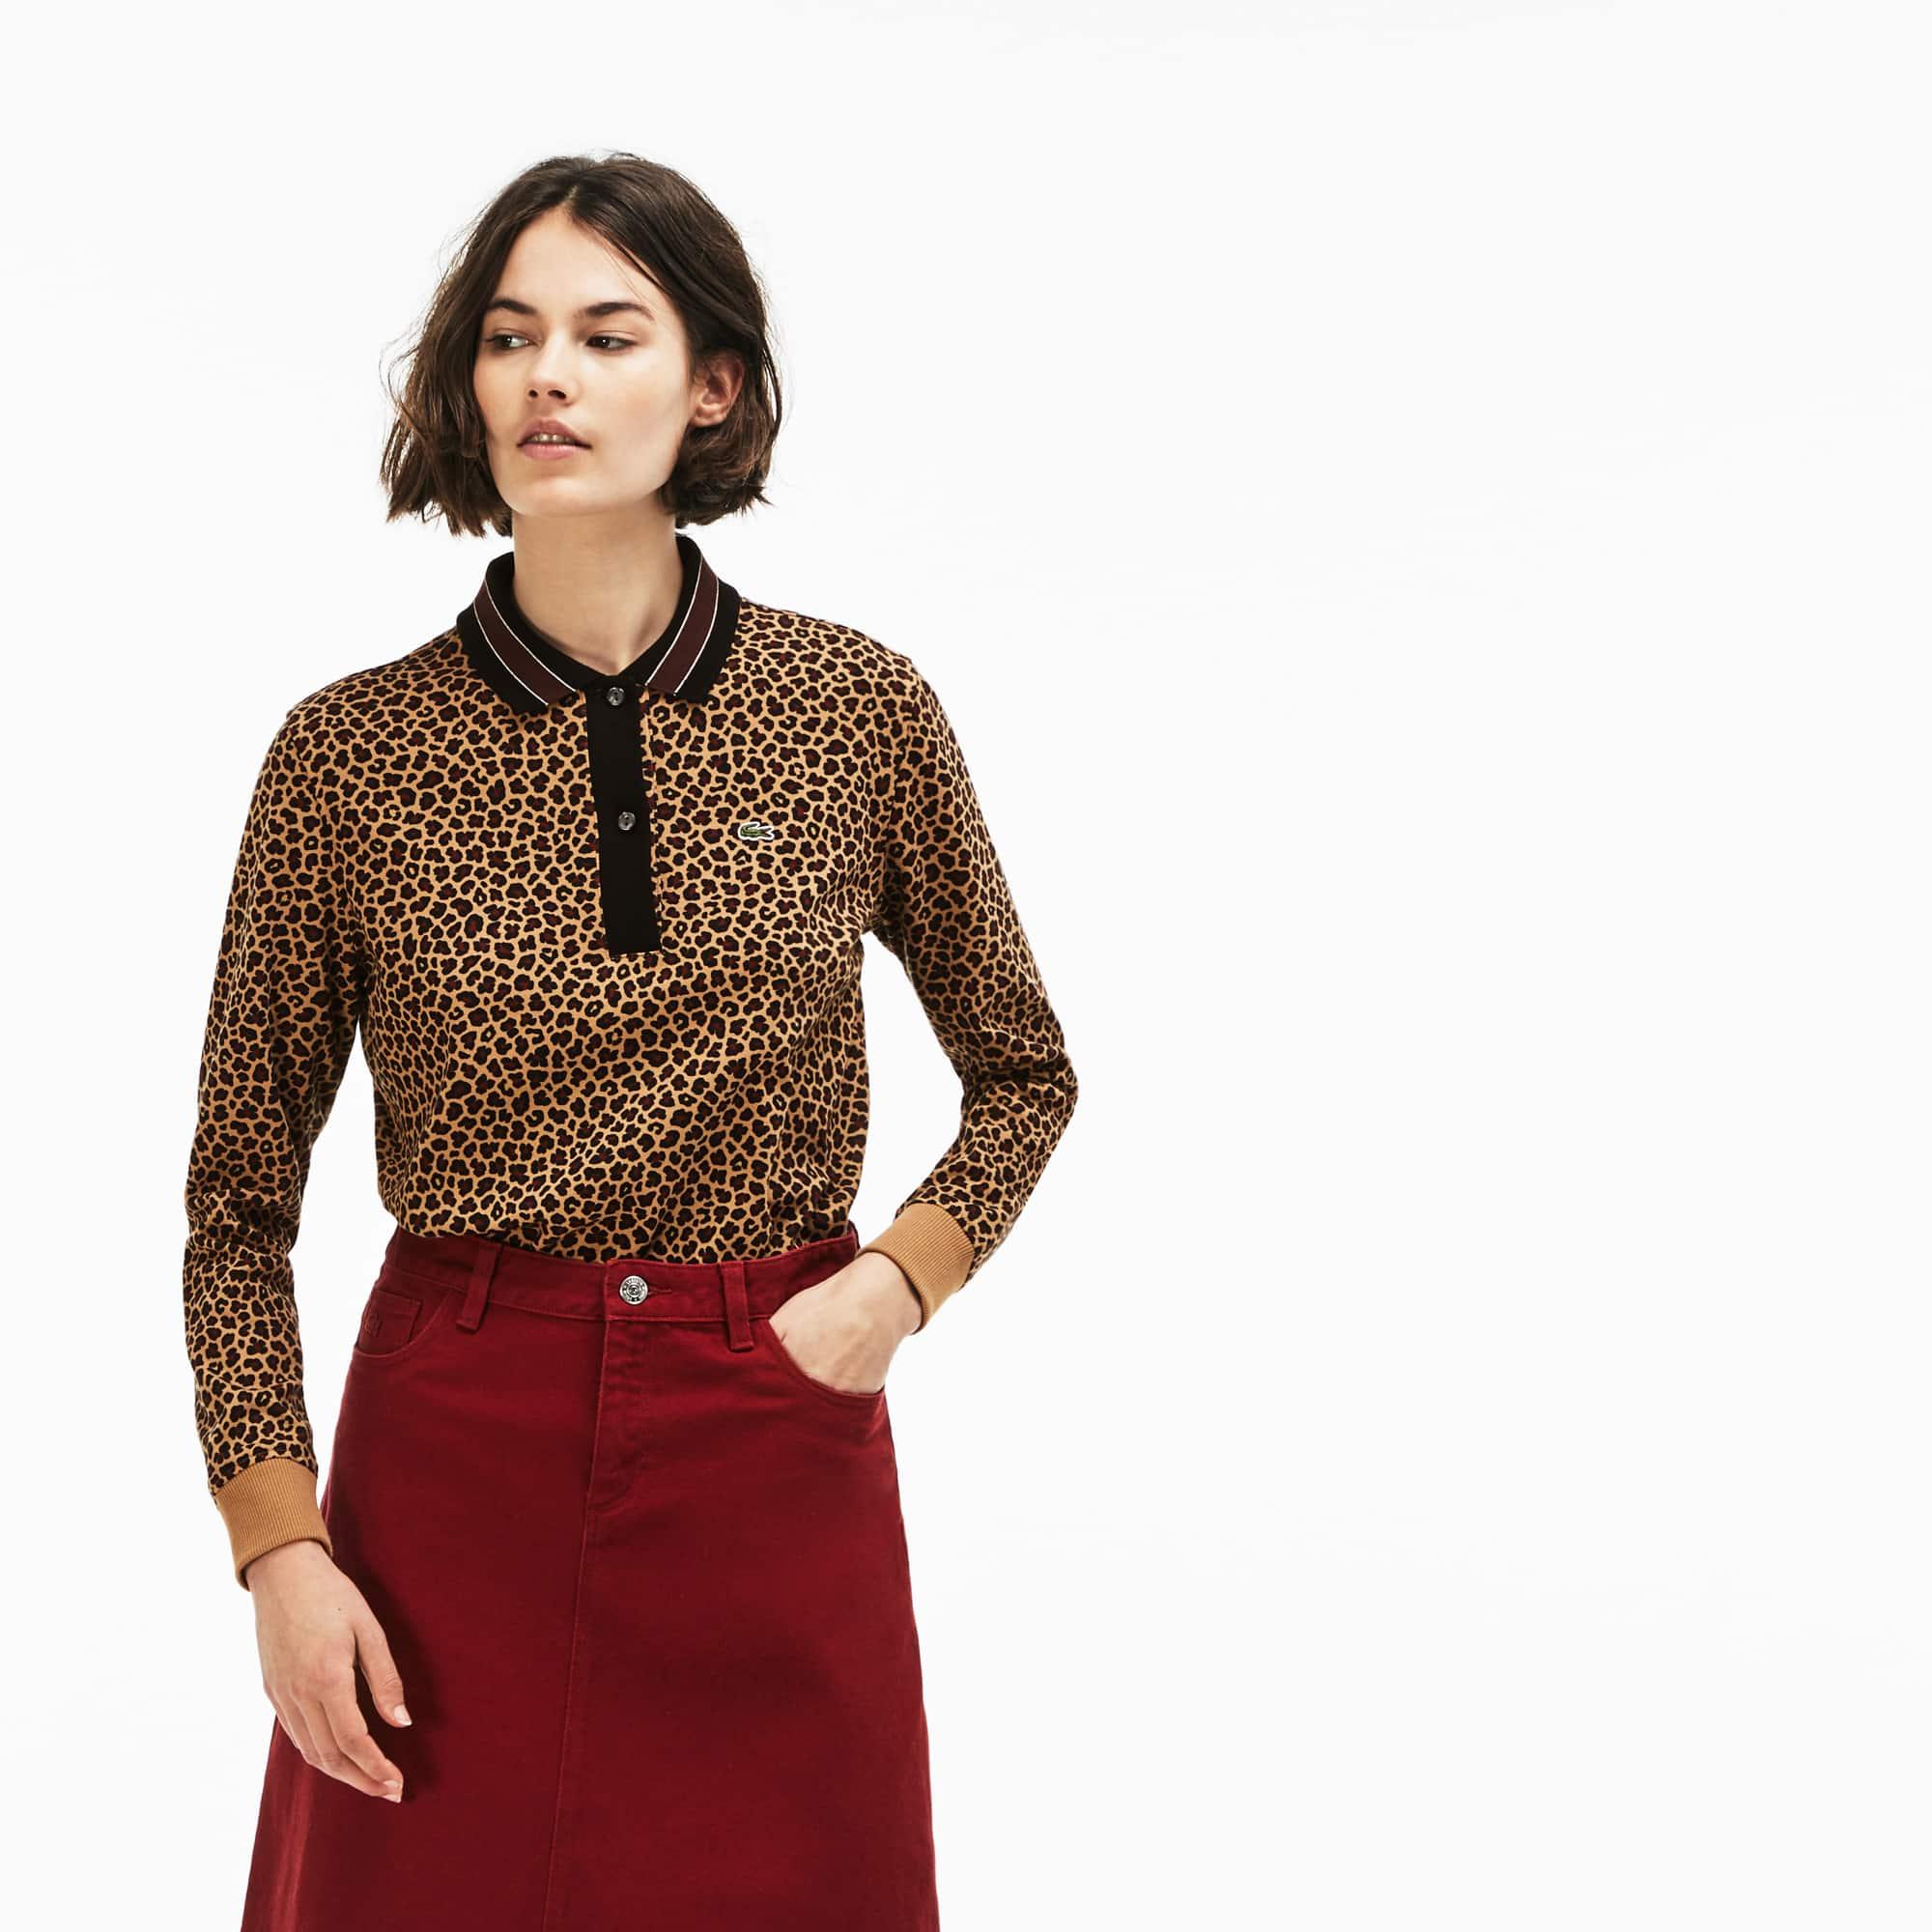 Women's Lacoste LIVE Boxy Fit Leopard Print Cotton Interlock Polo